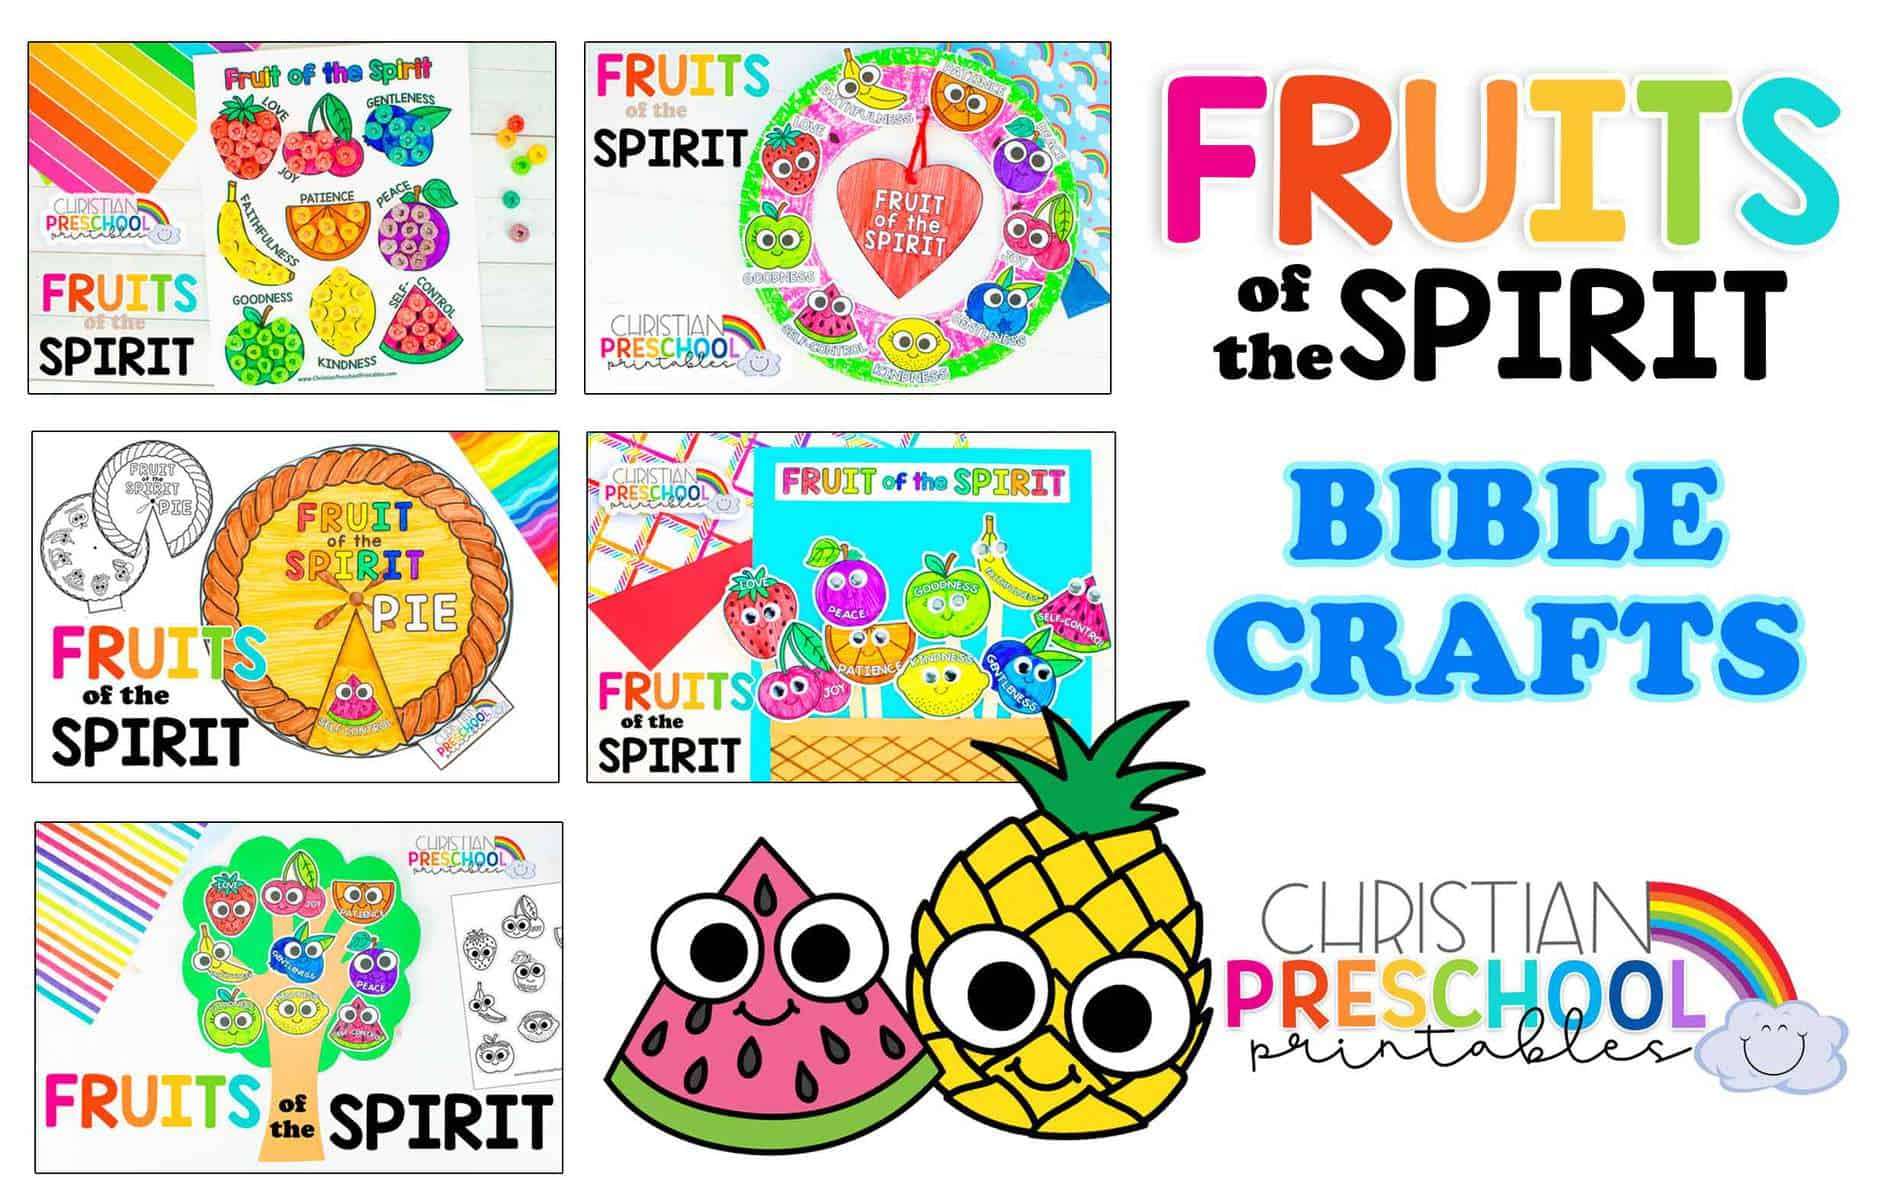 Fruitofthespiritcraft 2